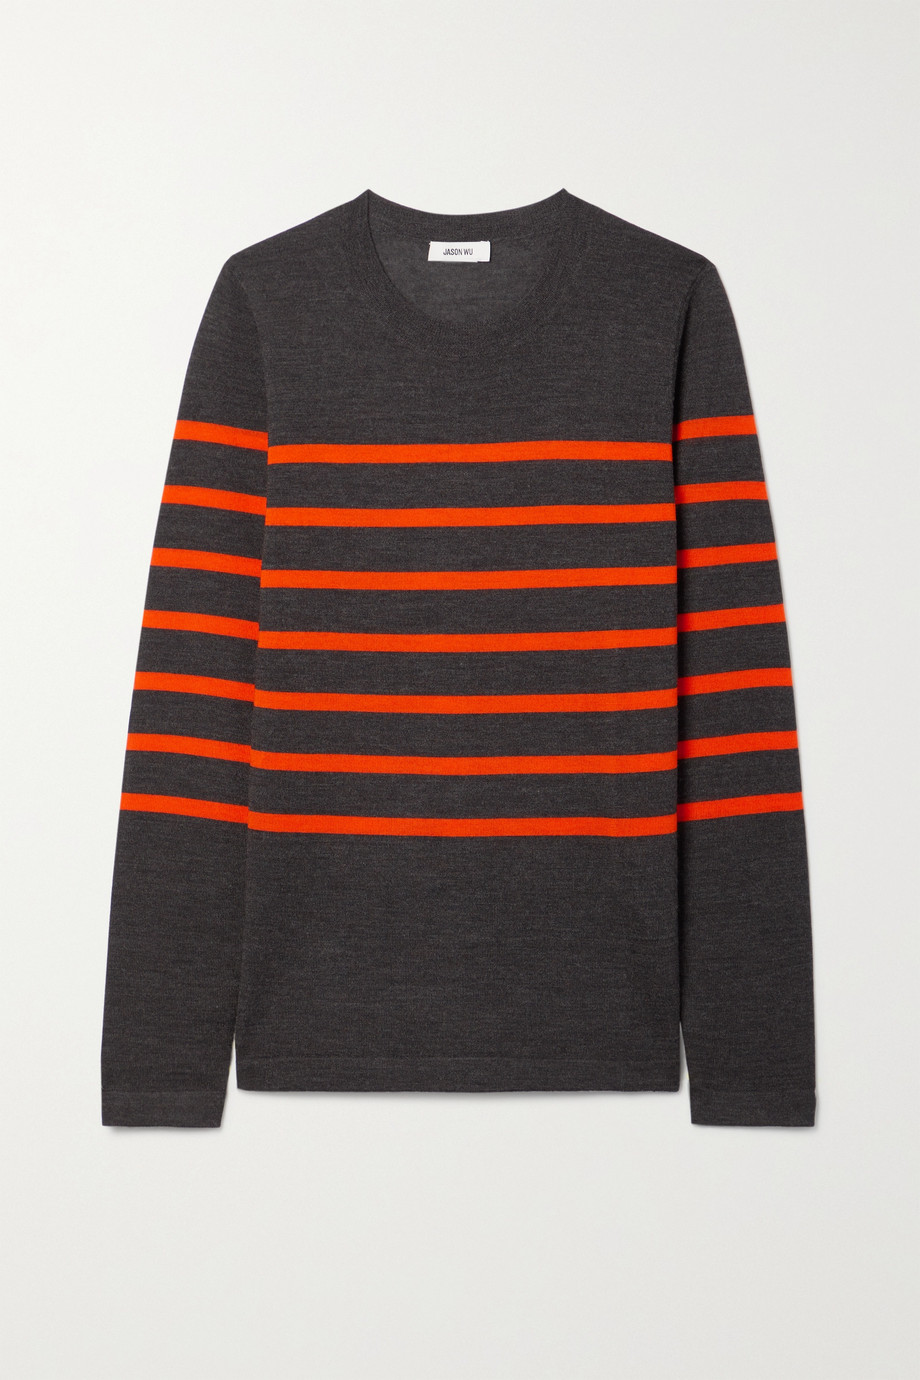 Jason Wu Pull en laine à rayures